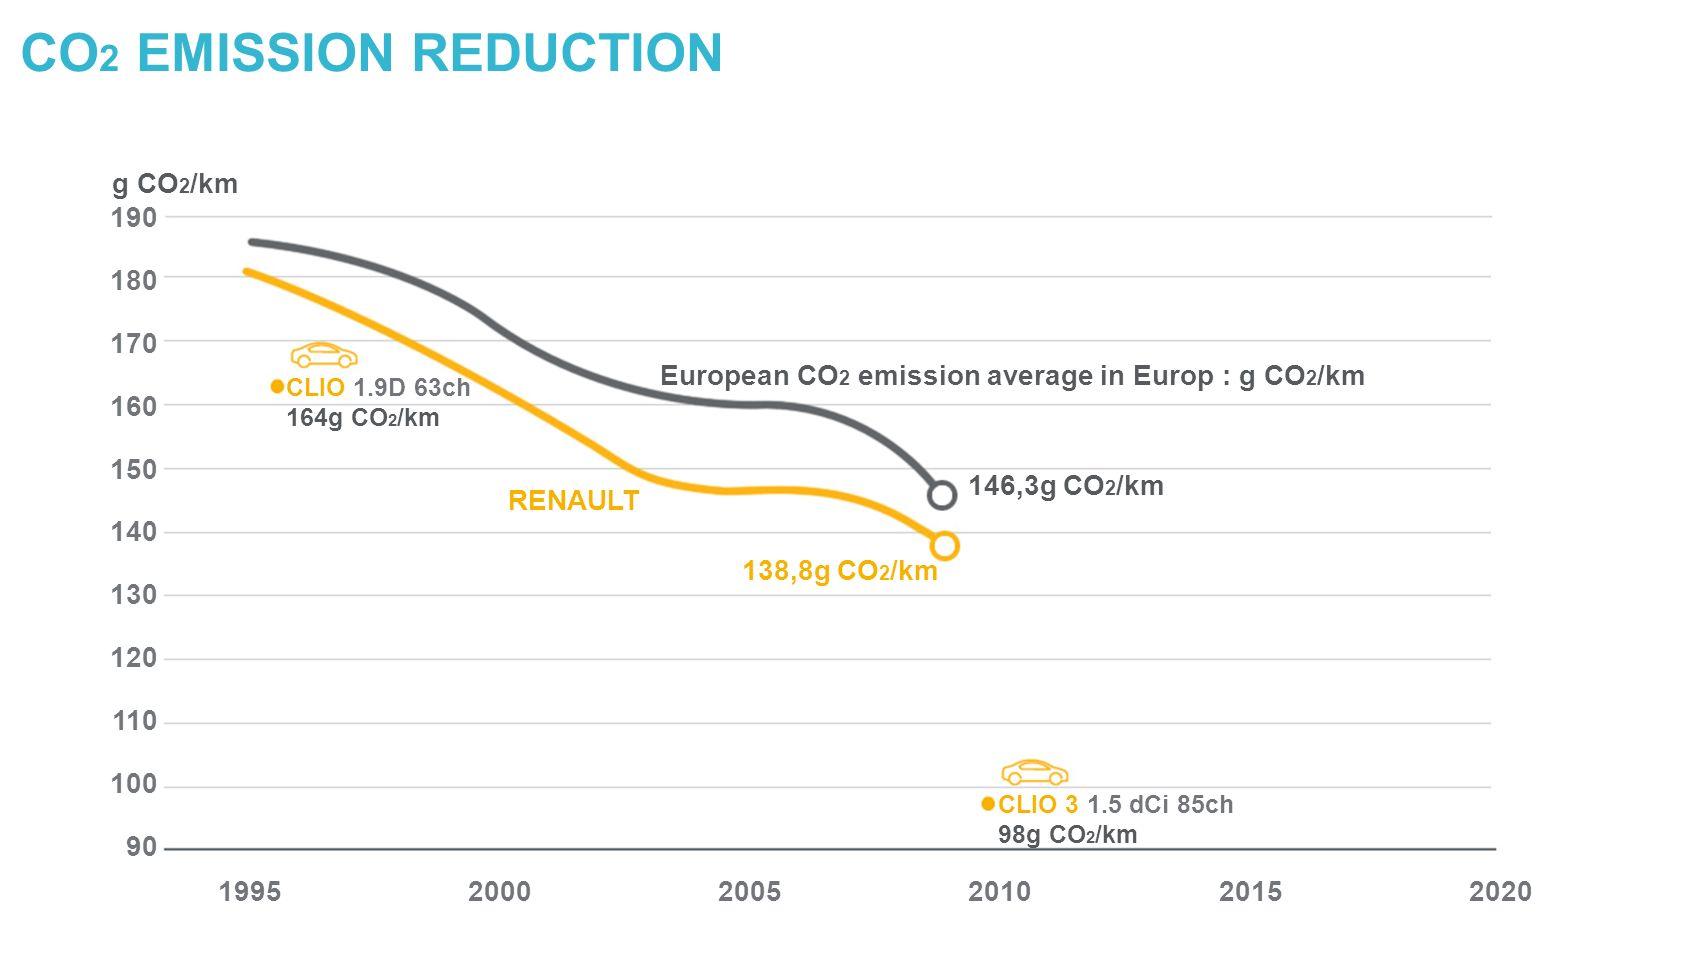 CO 2 EMISSION REDUCTION g CO 2 /km 190 180 170 160 150 140 130 120 110 100 90 199520002005201020152020 European CO 2 emission average in Europ : g CO 2 /km 146,3g CO 2 /km 138,8g CO 2 /km RENAULT CLIO 1.9D 63ch 164g CO 2 /km CLIO 3 1.5 dCi 85ch 98g CO 2 /km